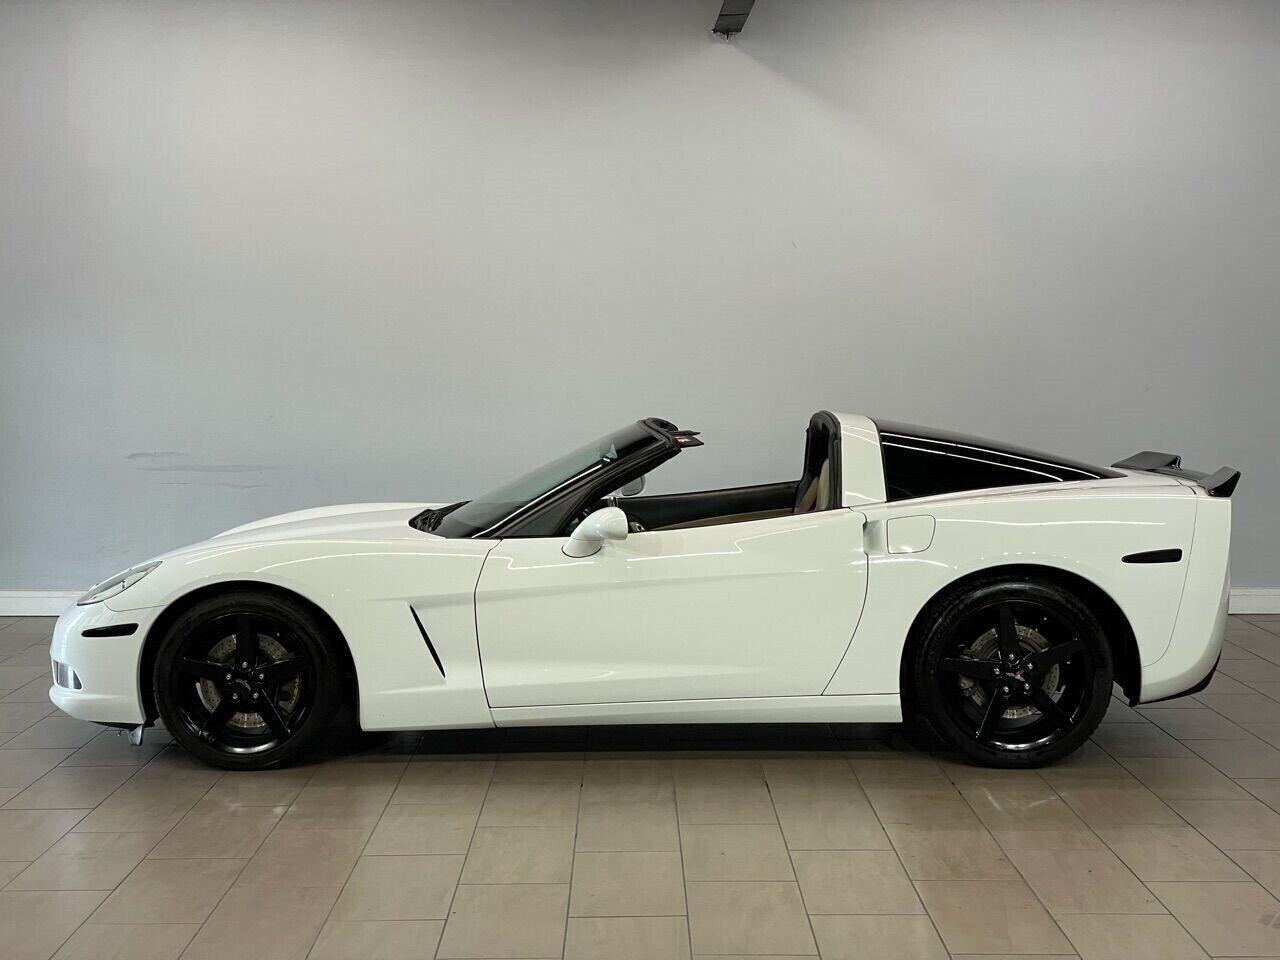 2007 White Chevrolet Corvette Coupe  | C6 Corvette Photo 8